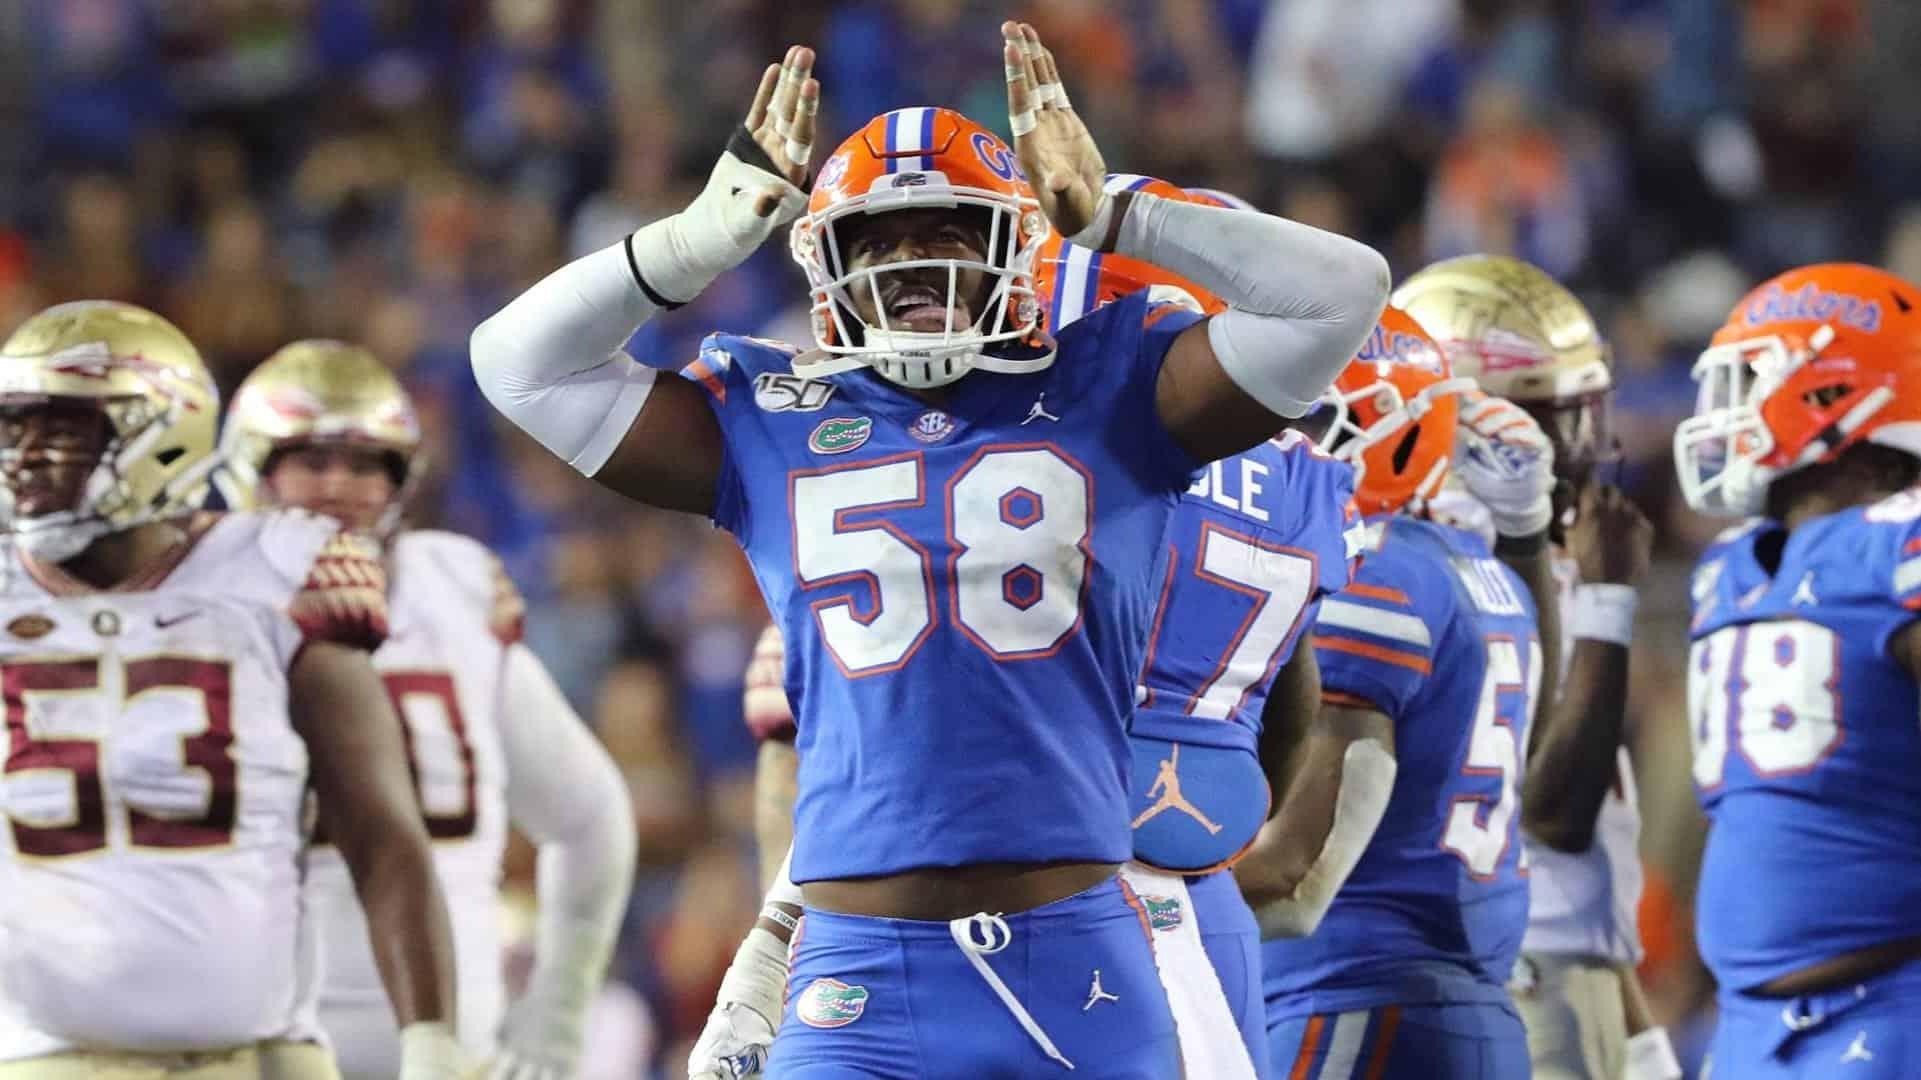 2019 College Bowl Preview: Orange Bowl - Florida vs Virginia